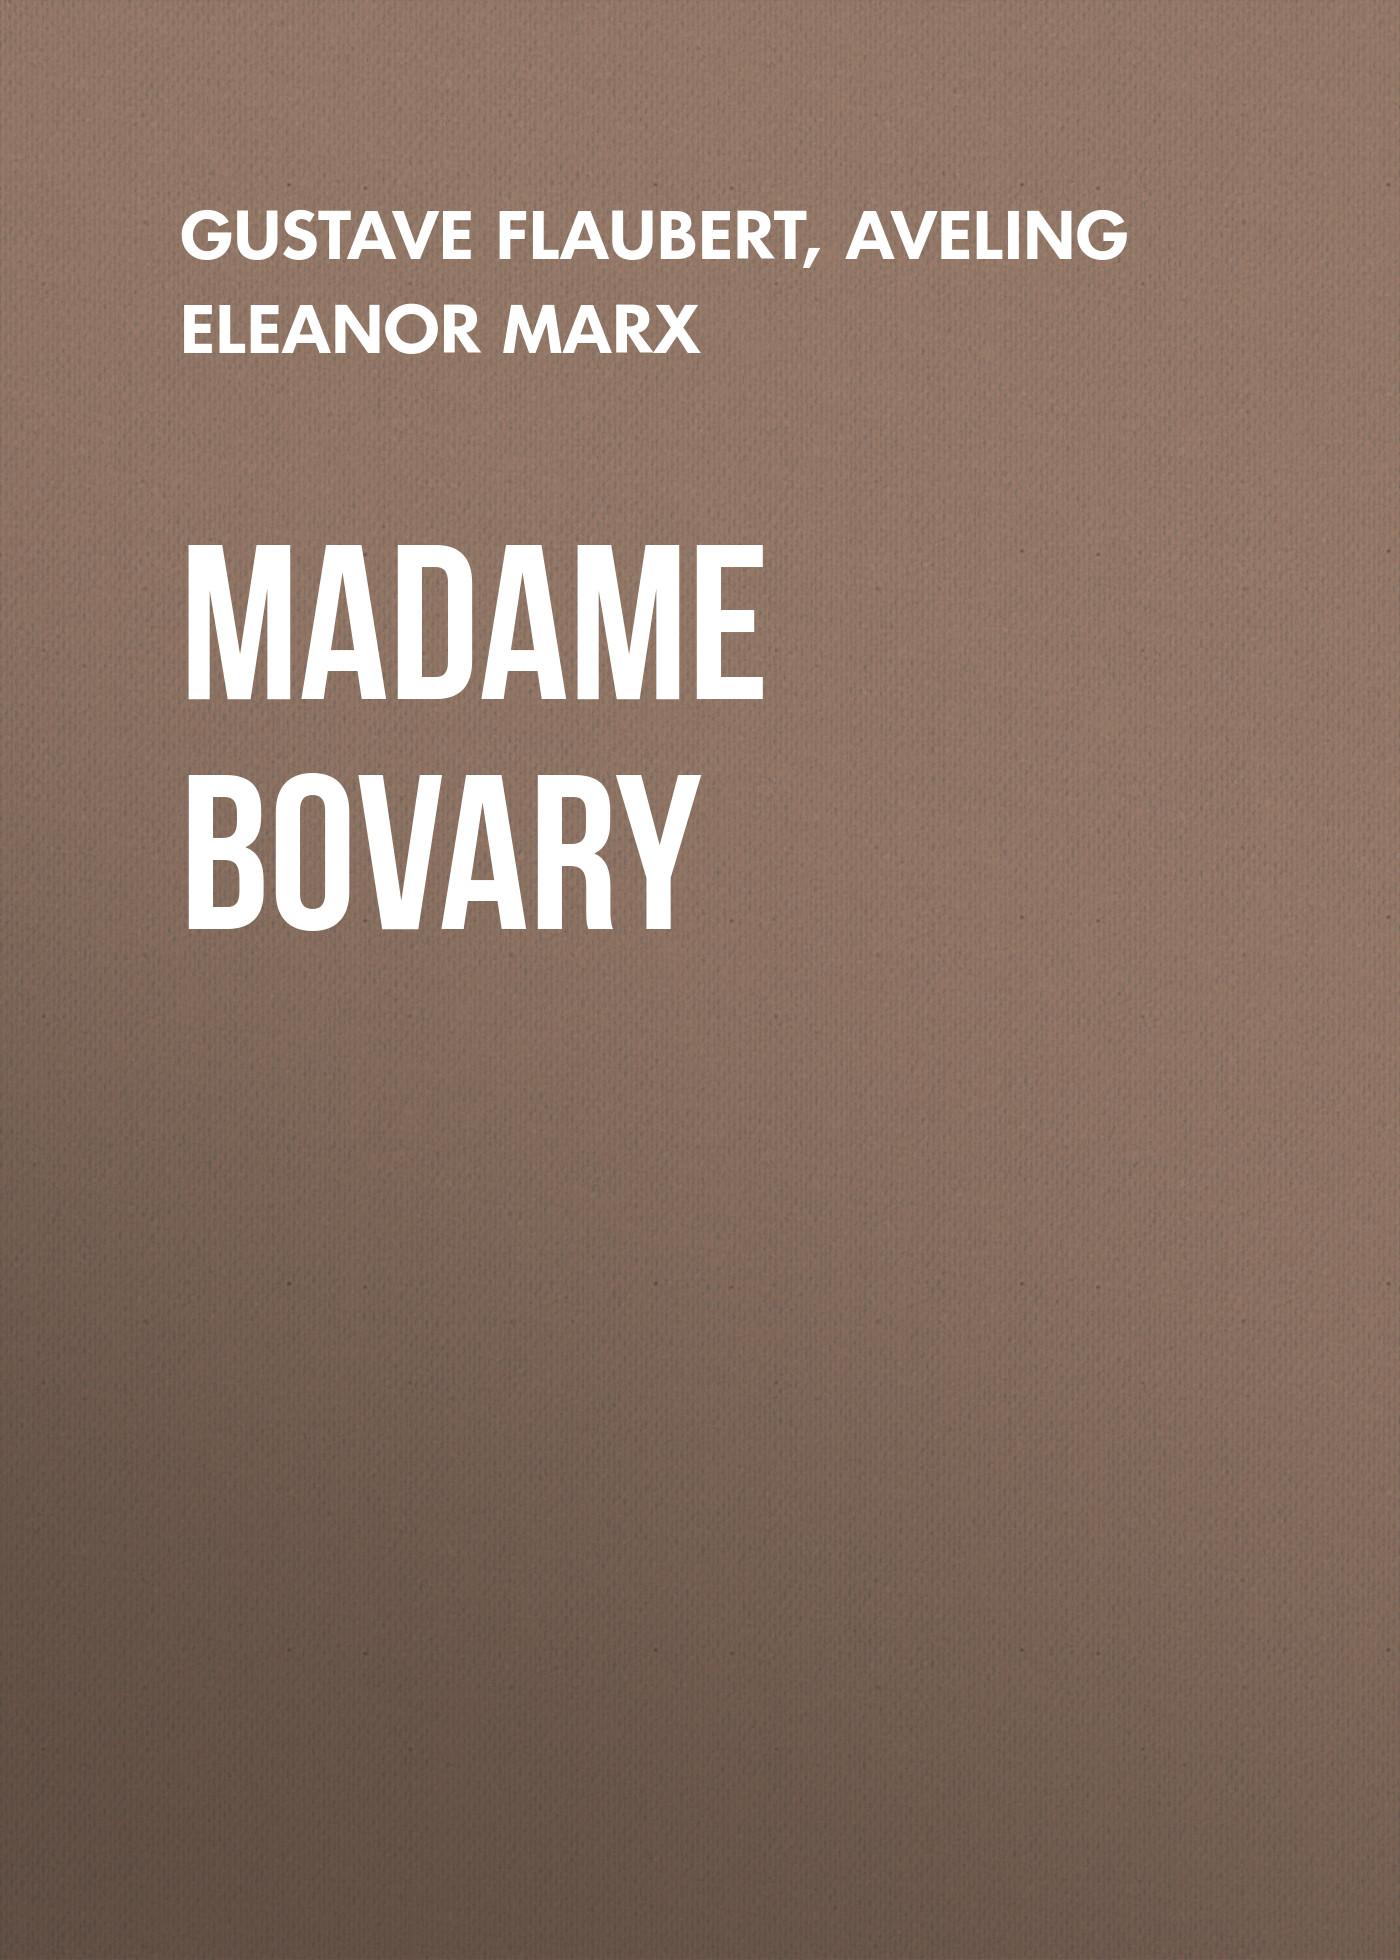 Gustave Flaubert Madame Bovary madame bovary bilingual chinese and english world famous novel